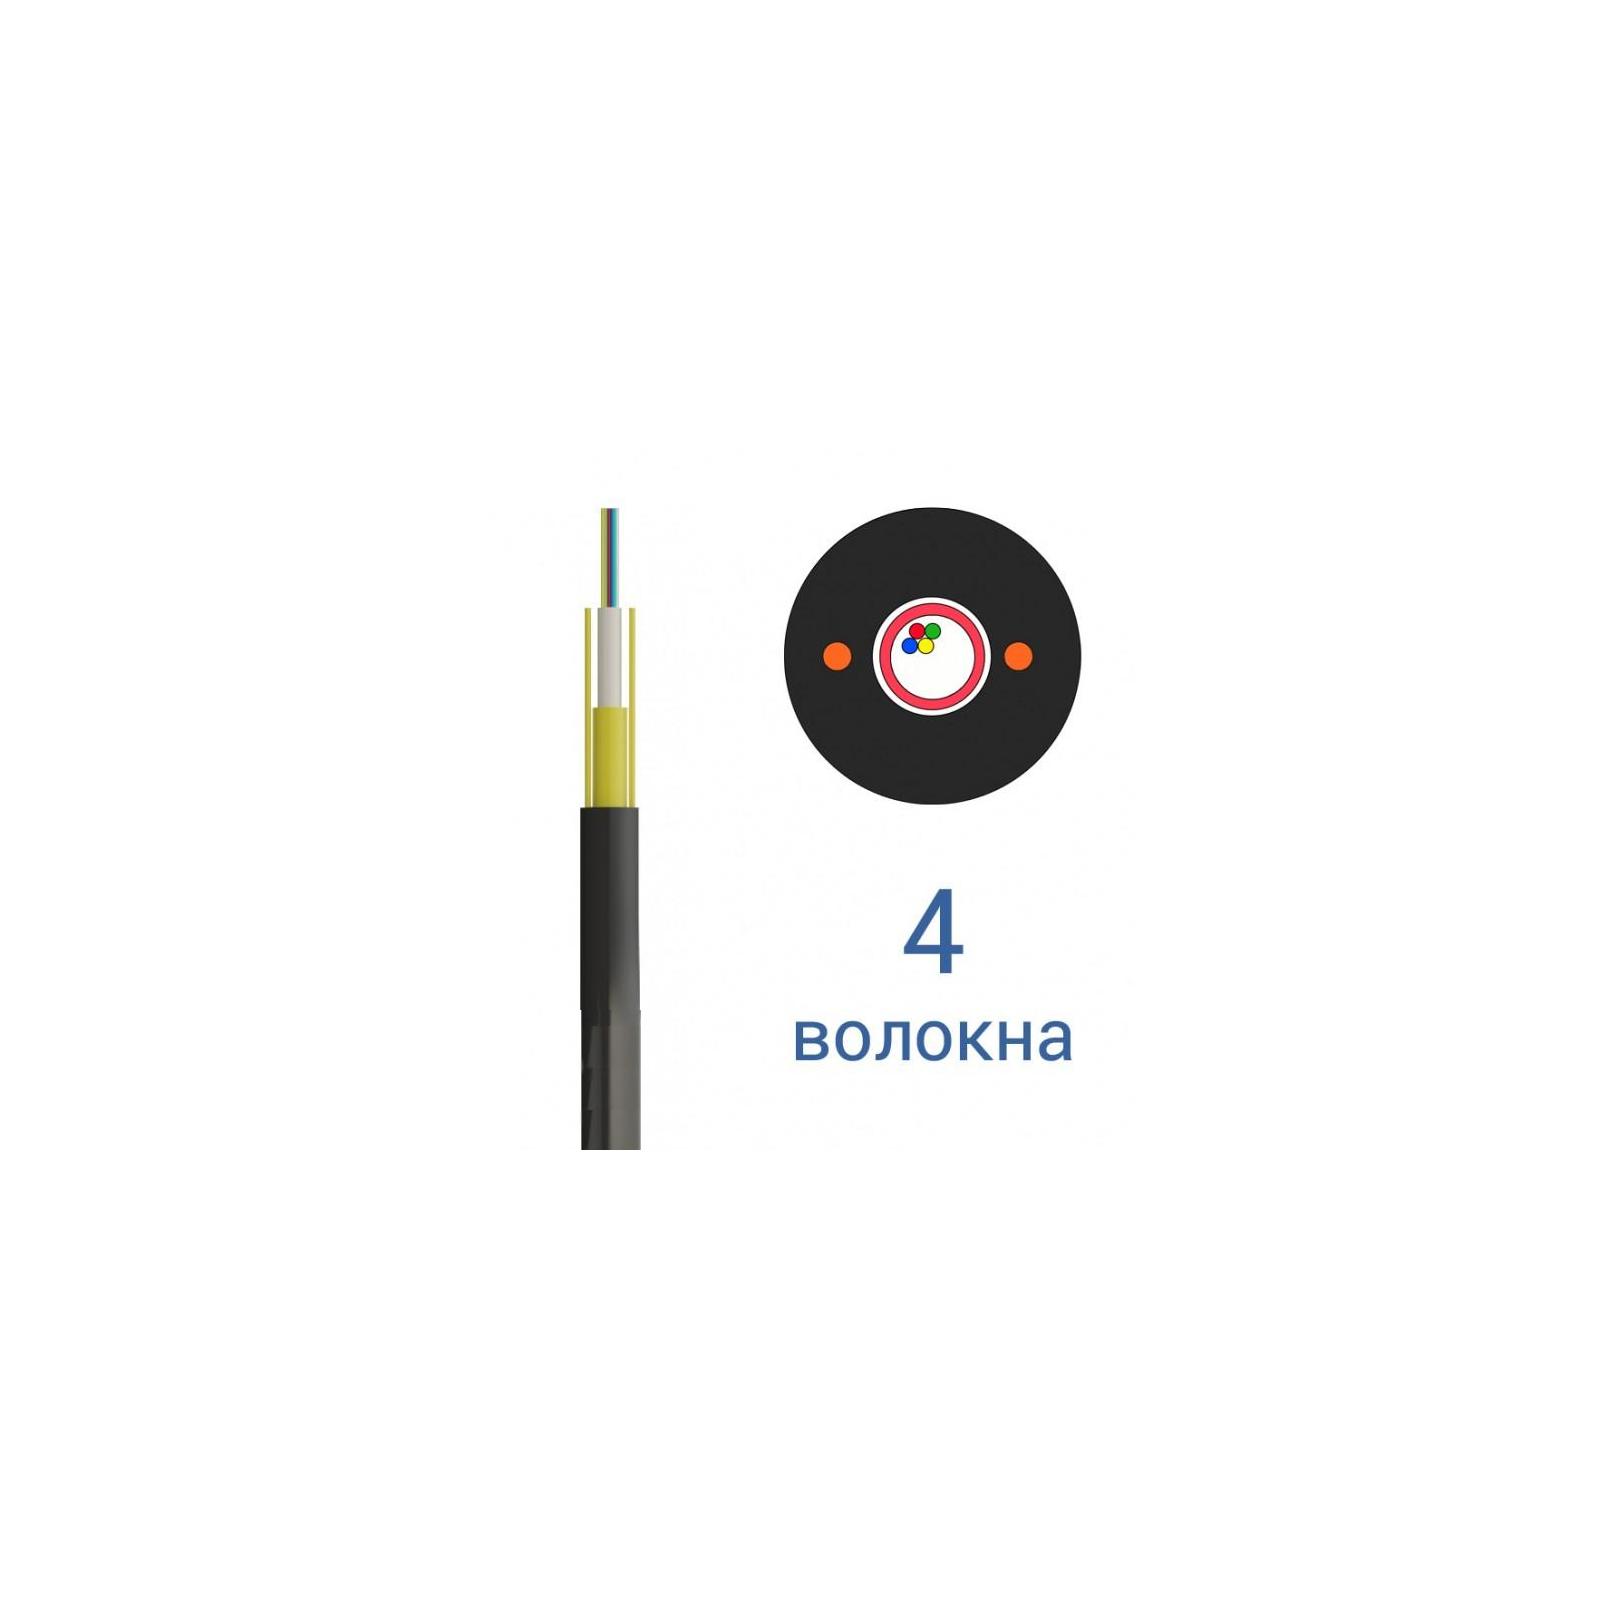 Кабель Одескабель ОКТ-Д(1,0)П-4Е1-0,36Ф3,5/0,22Н18-4, 4 волокна, 1м (ОКТ-Д(1,0)П-4Е1)